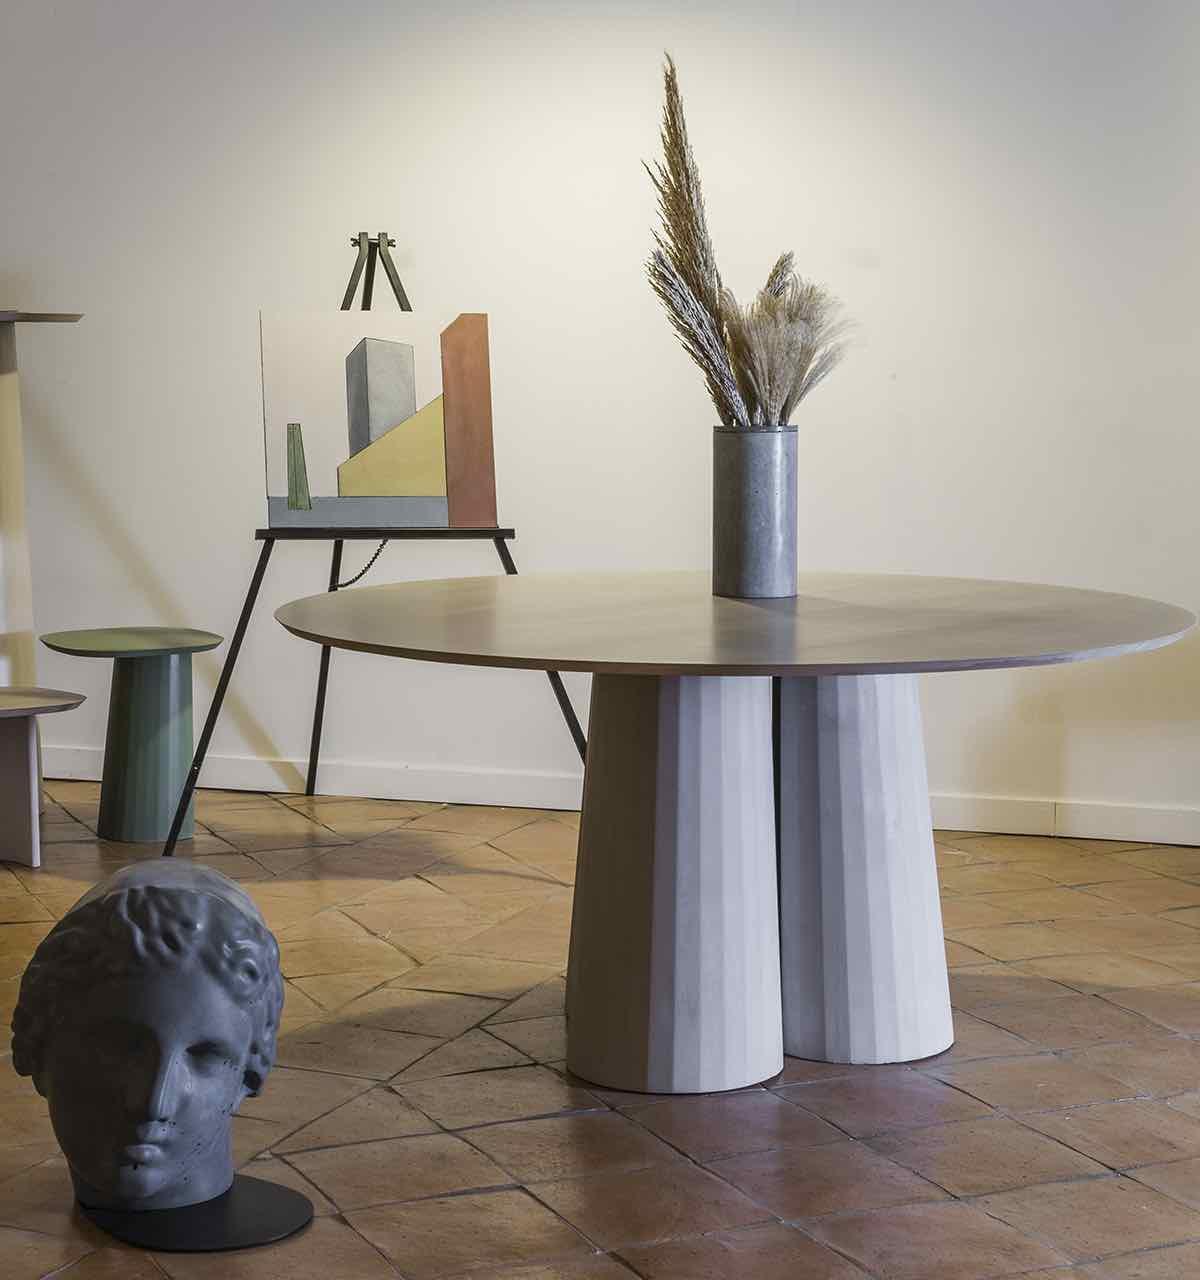 EDIT Napoli 2020 - Forma&Cemento ©Serena Eller Vainicher.